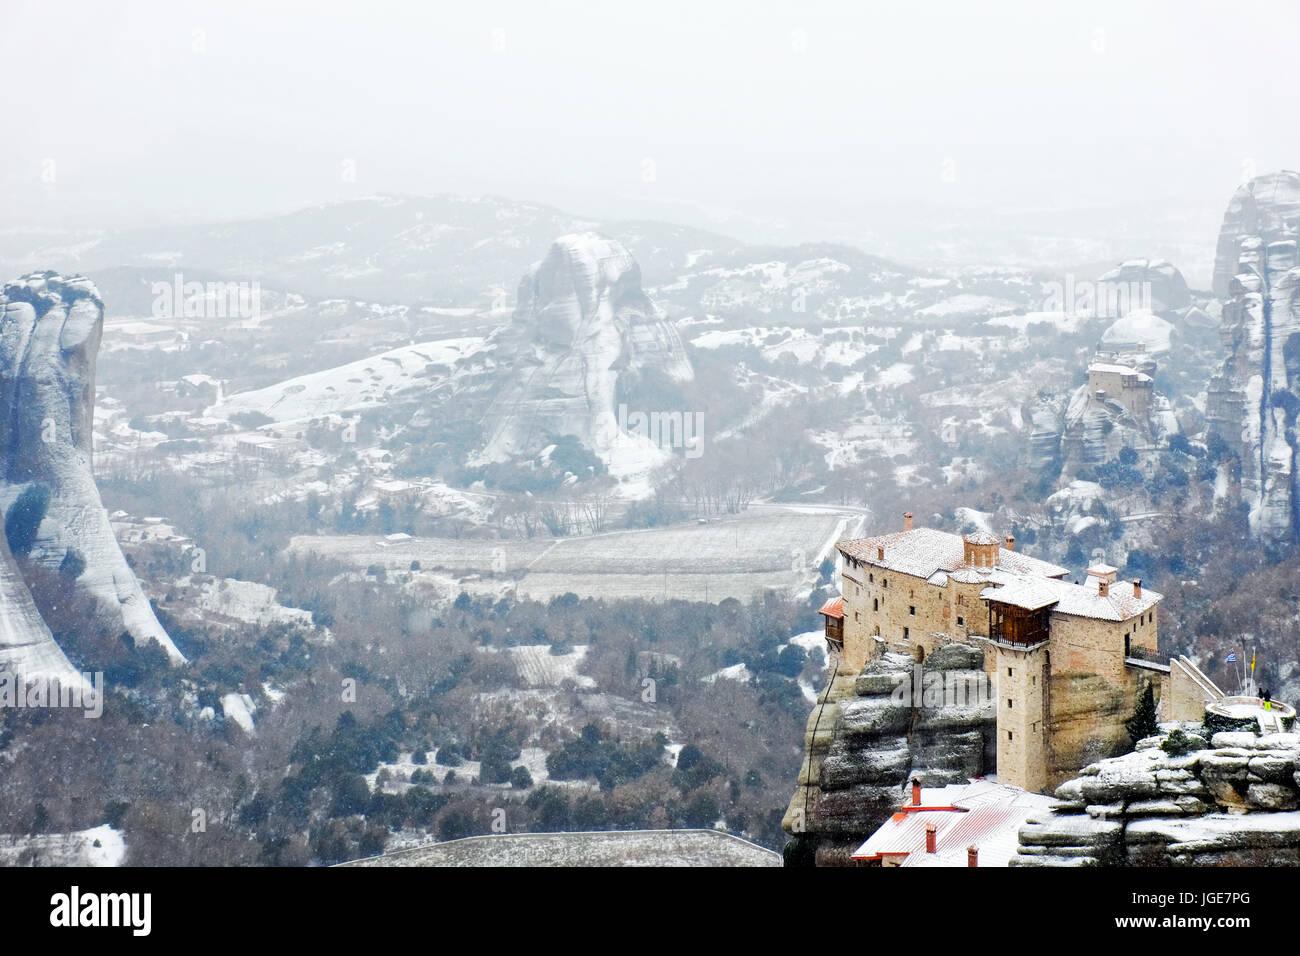 Das heilige Kloster Rousanou unter starkem Schneefall, Meteora, Kalabaka, Griechenland Stockbild